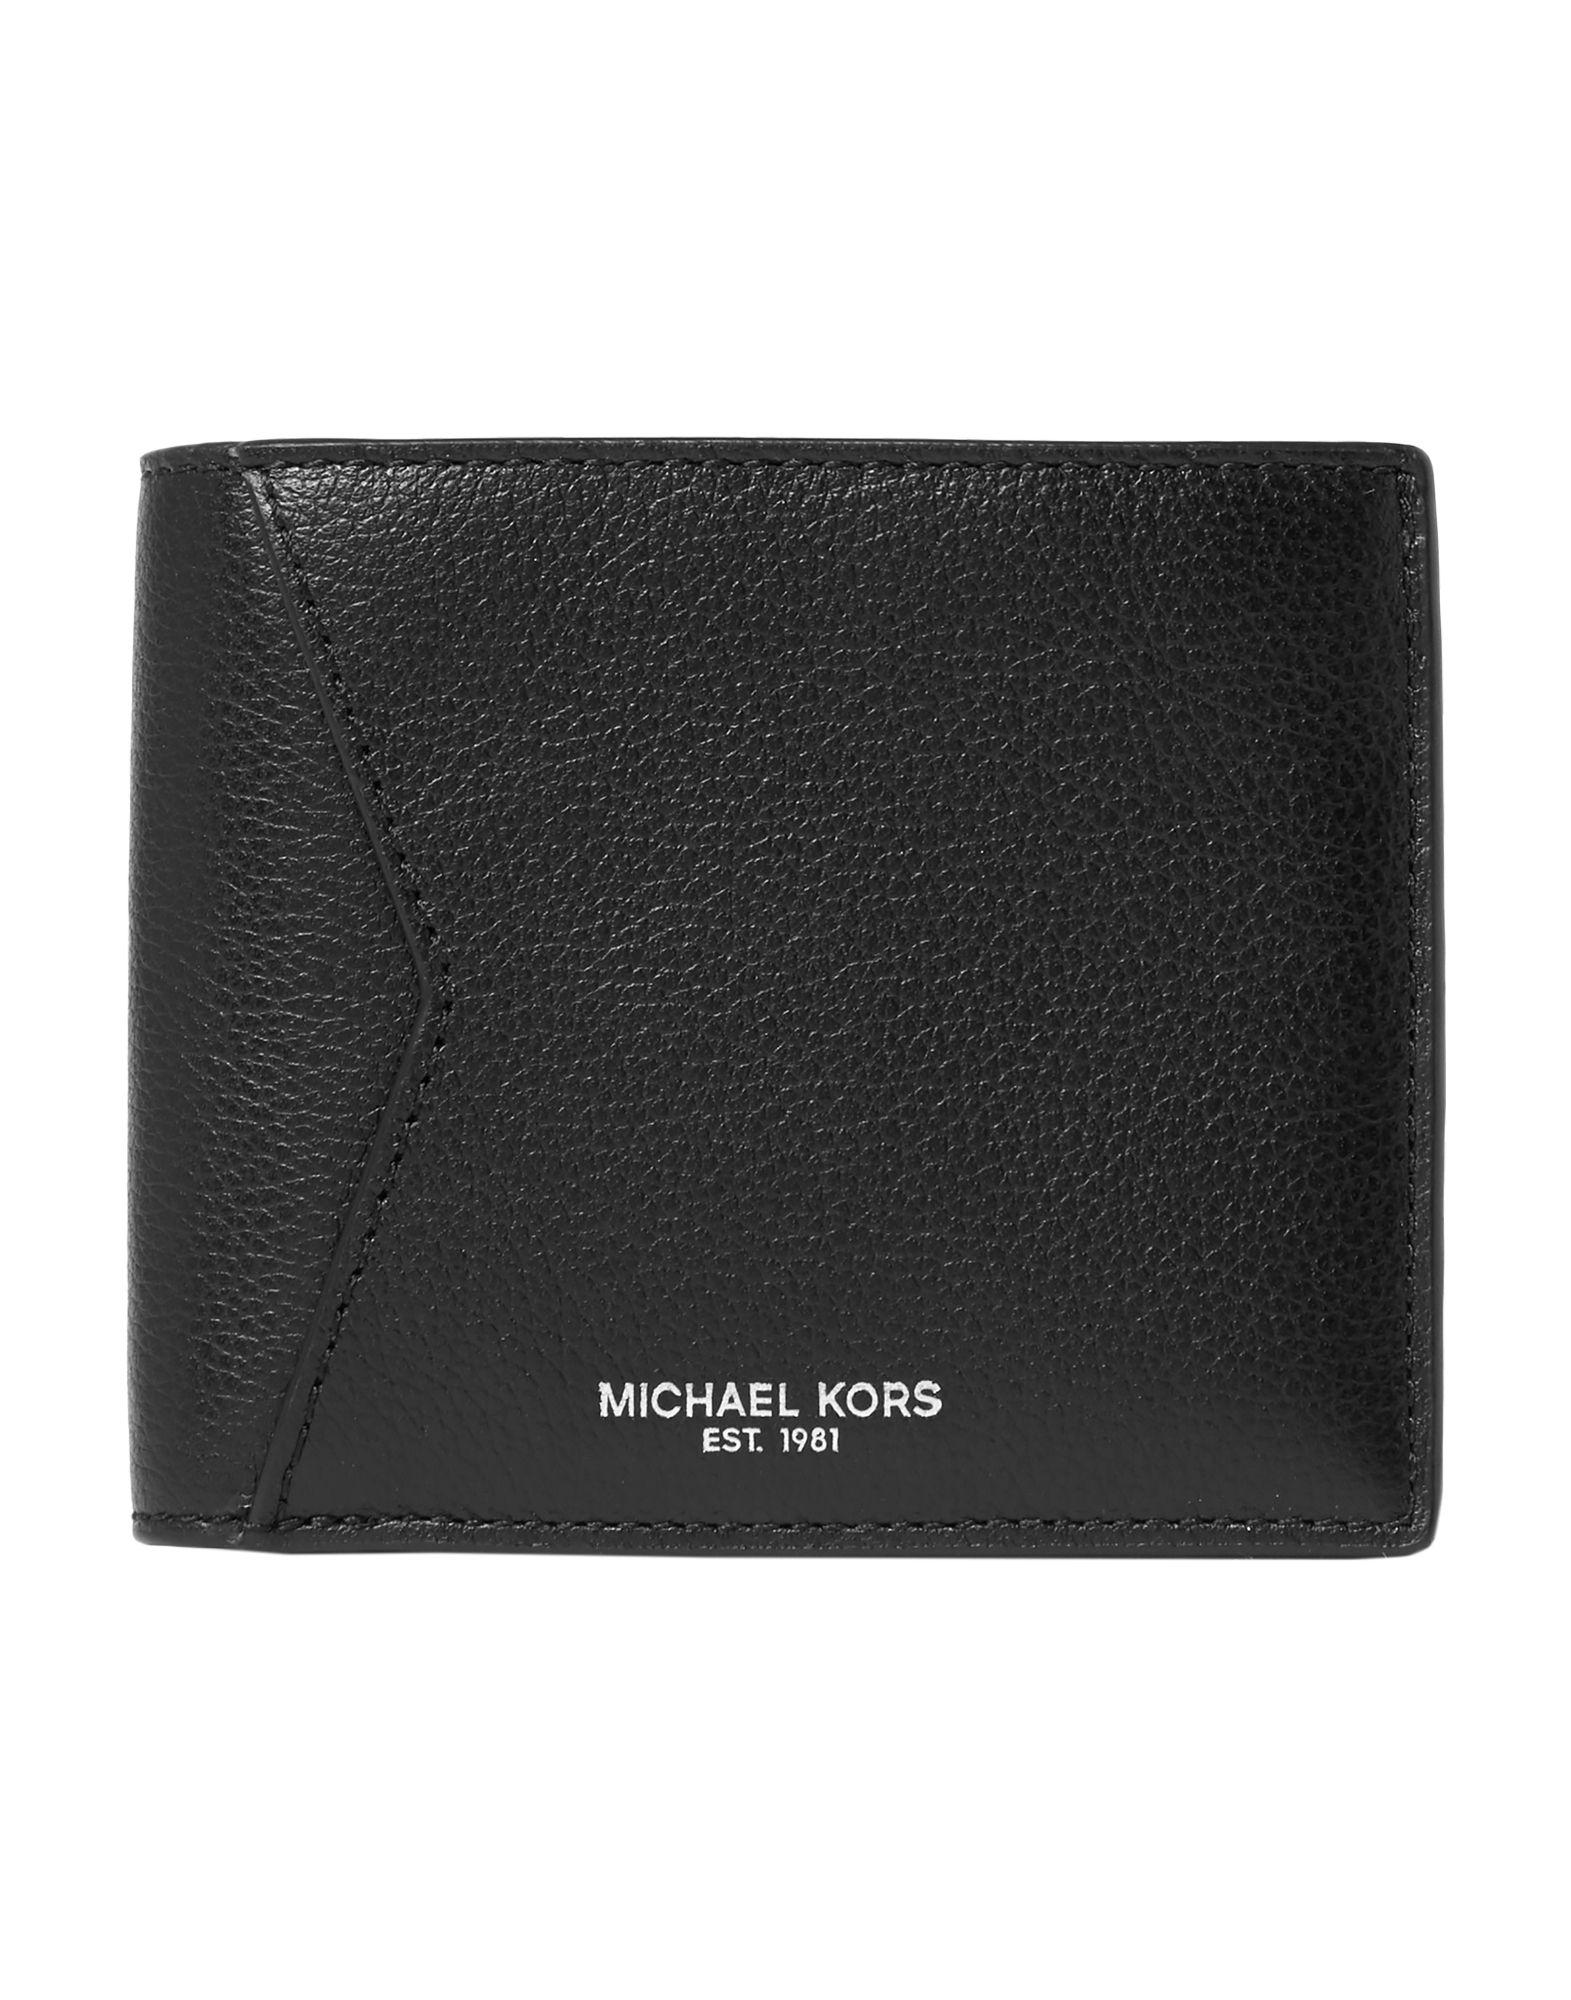 MICHAEL KORS Бумажник бумажник michael kors 32f3stve7l